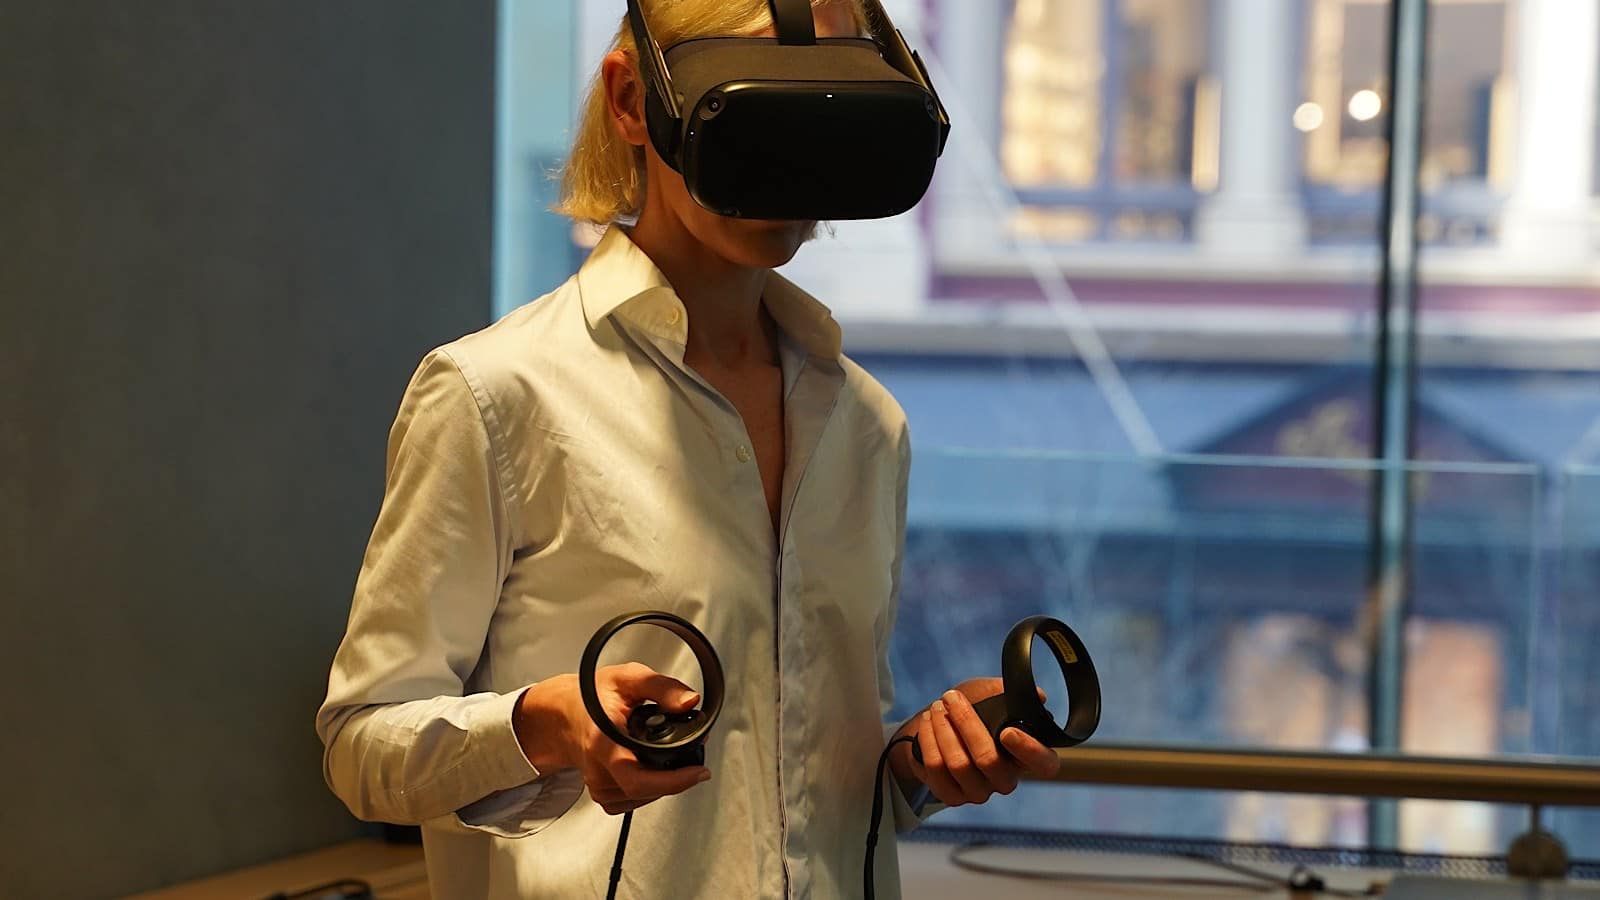 Optus 5G VR test in Sydney